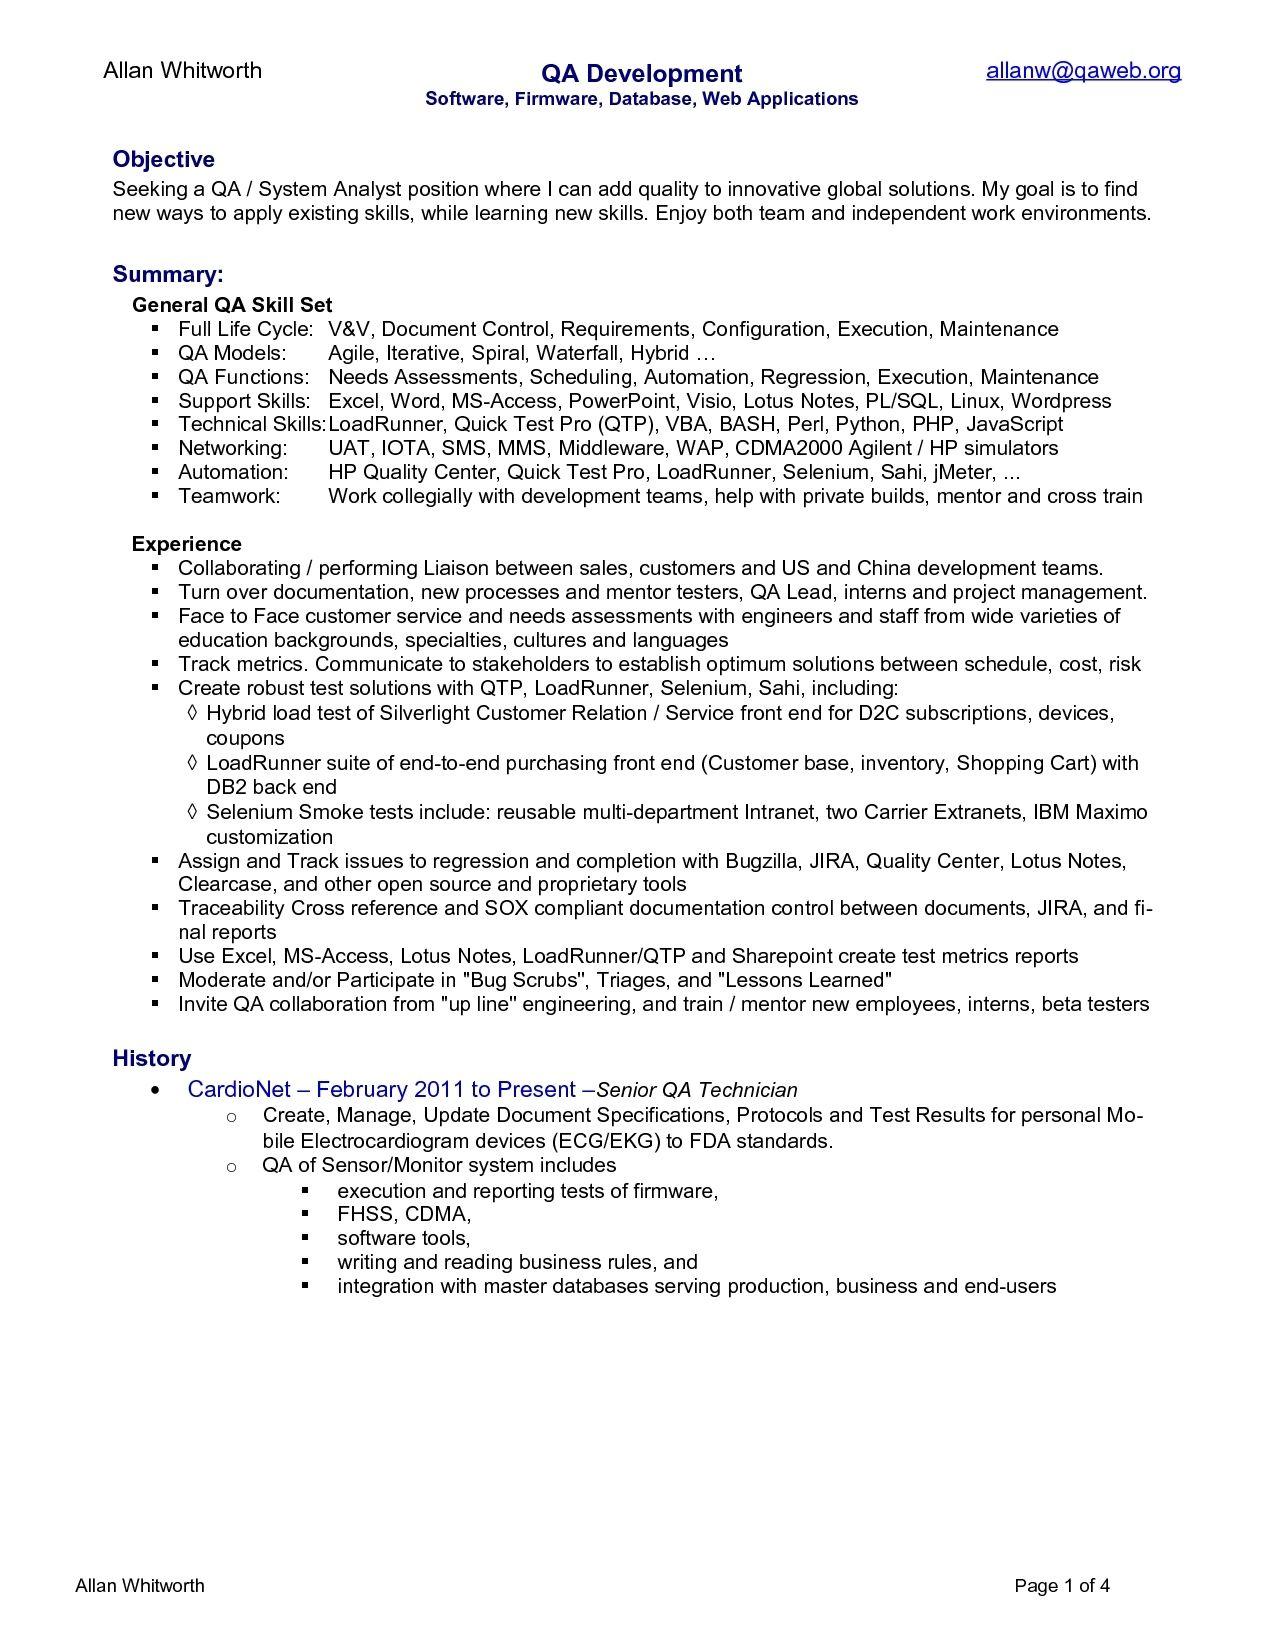 Quality Assurance Pharma With Images Job Resume